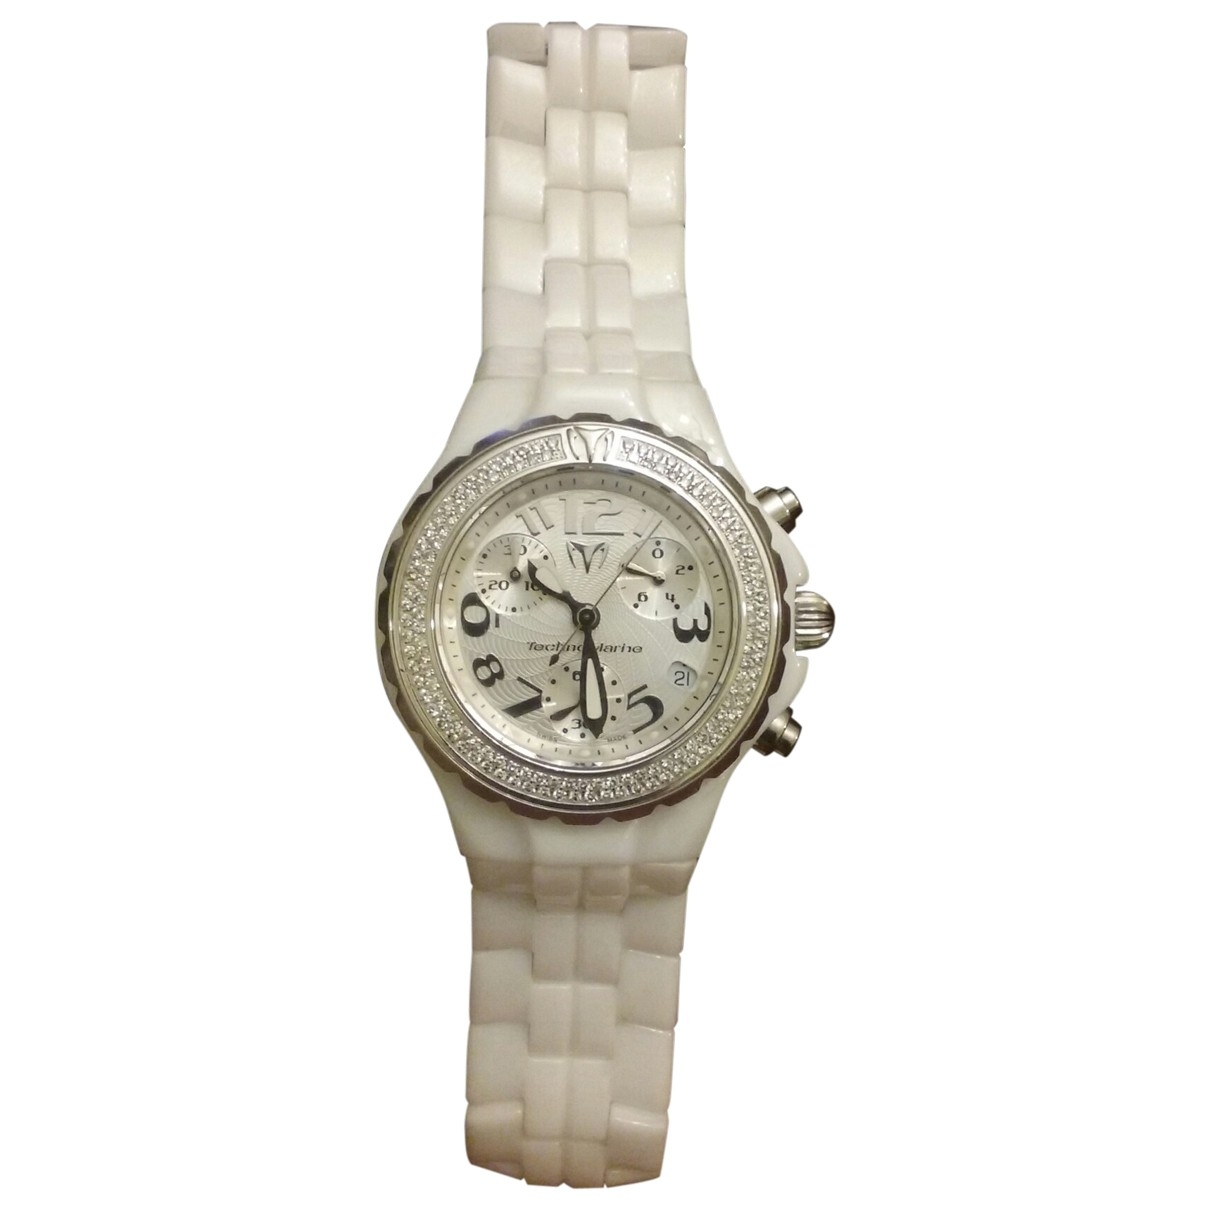 Reloj de Ceramica Technomarine, Geneve